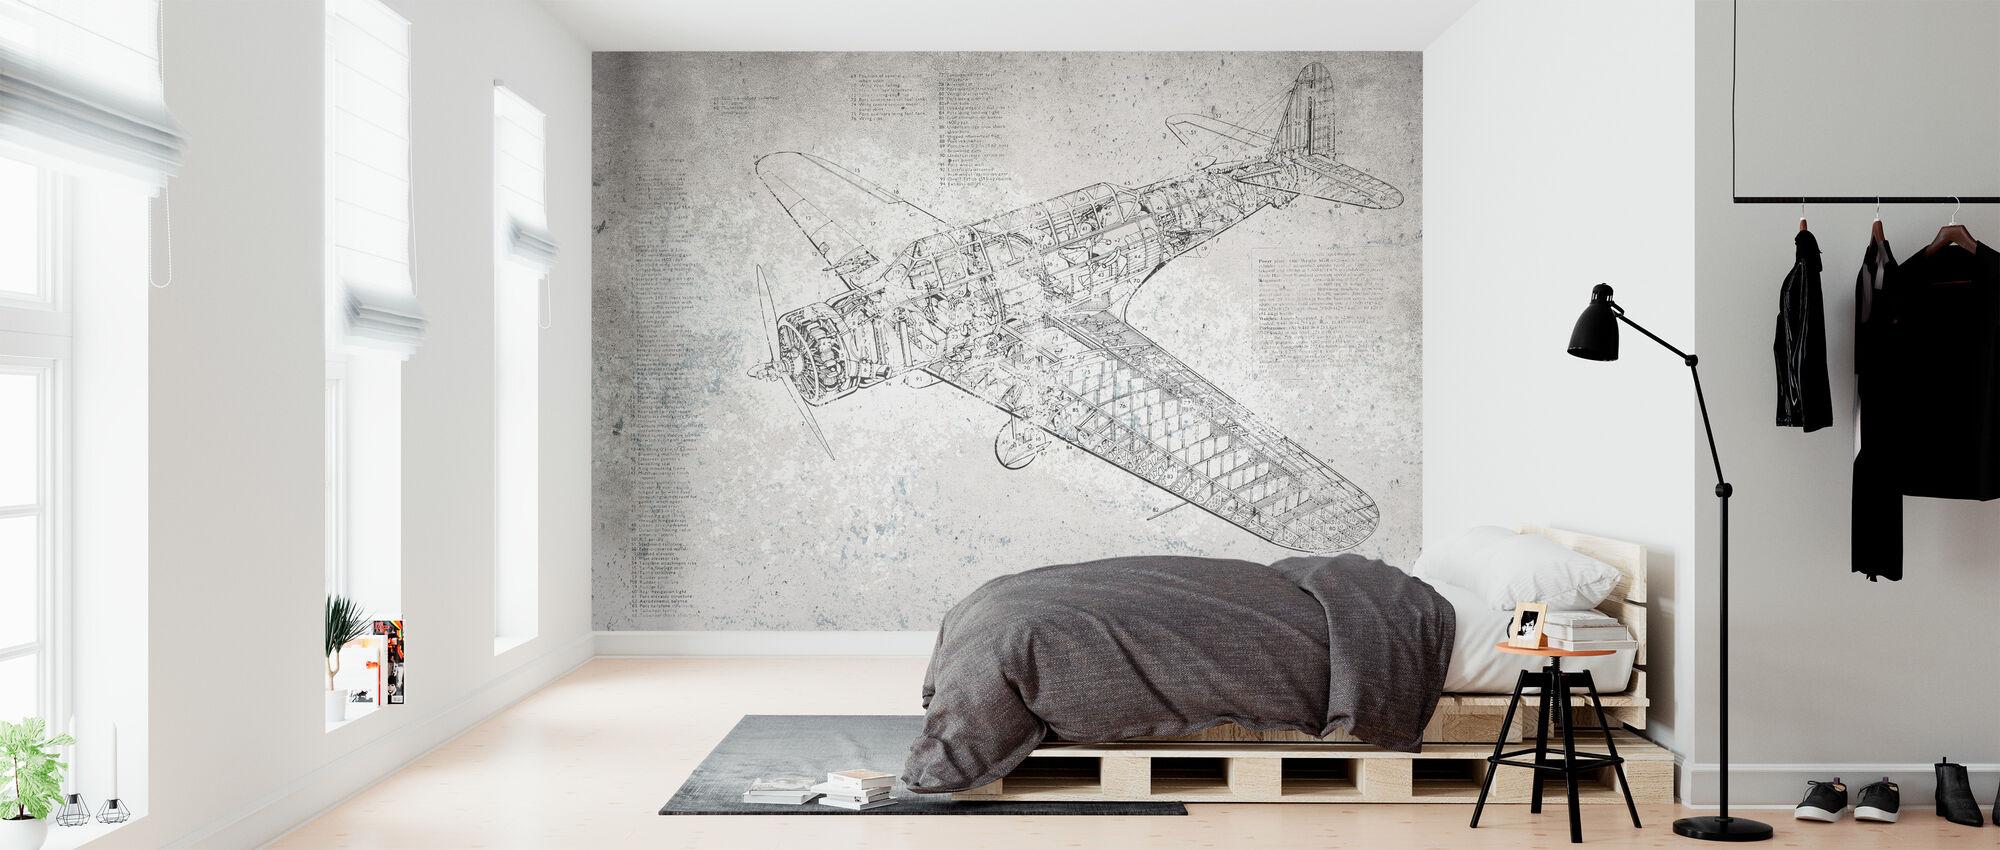 Retro Airplane - Wallpaper - Bedroom